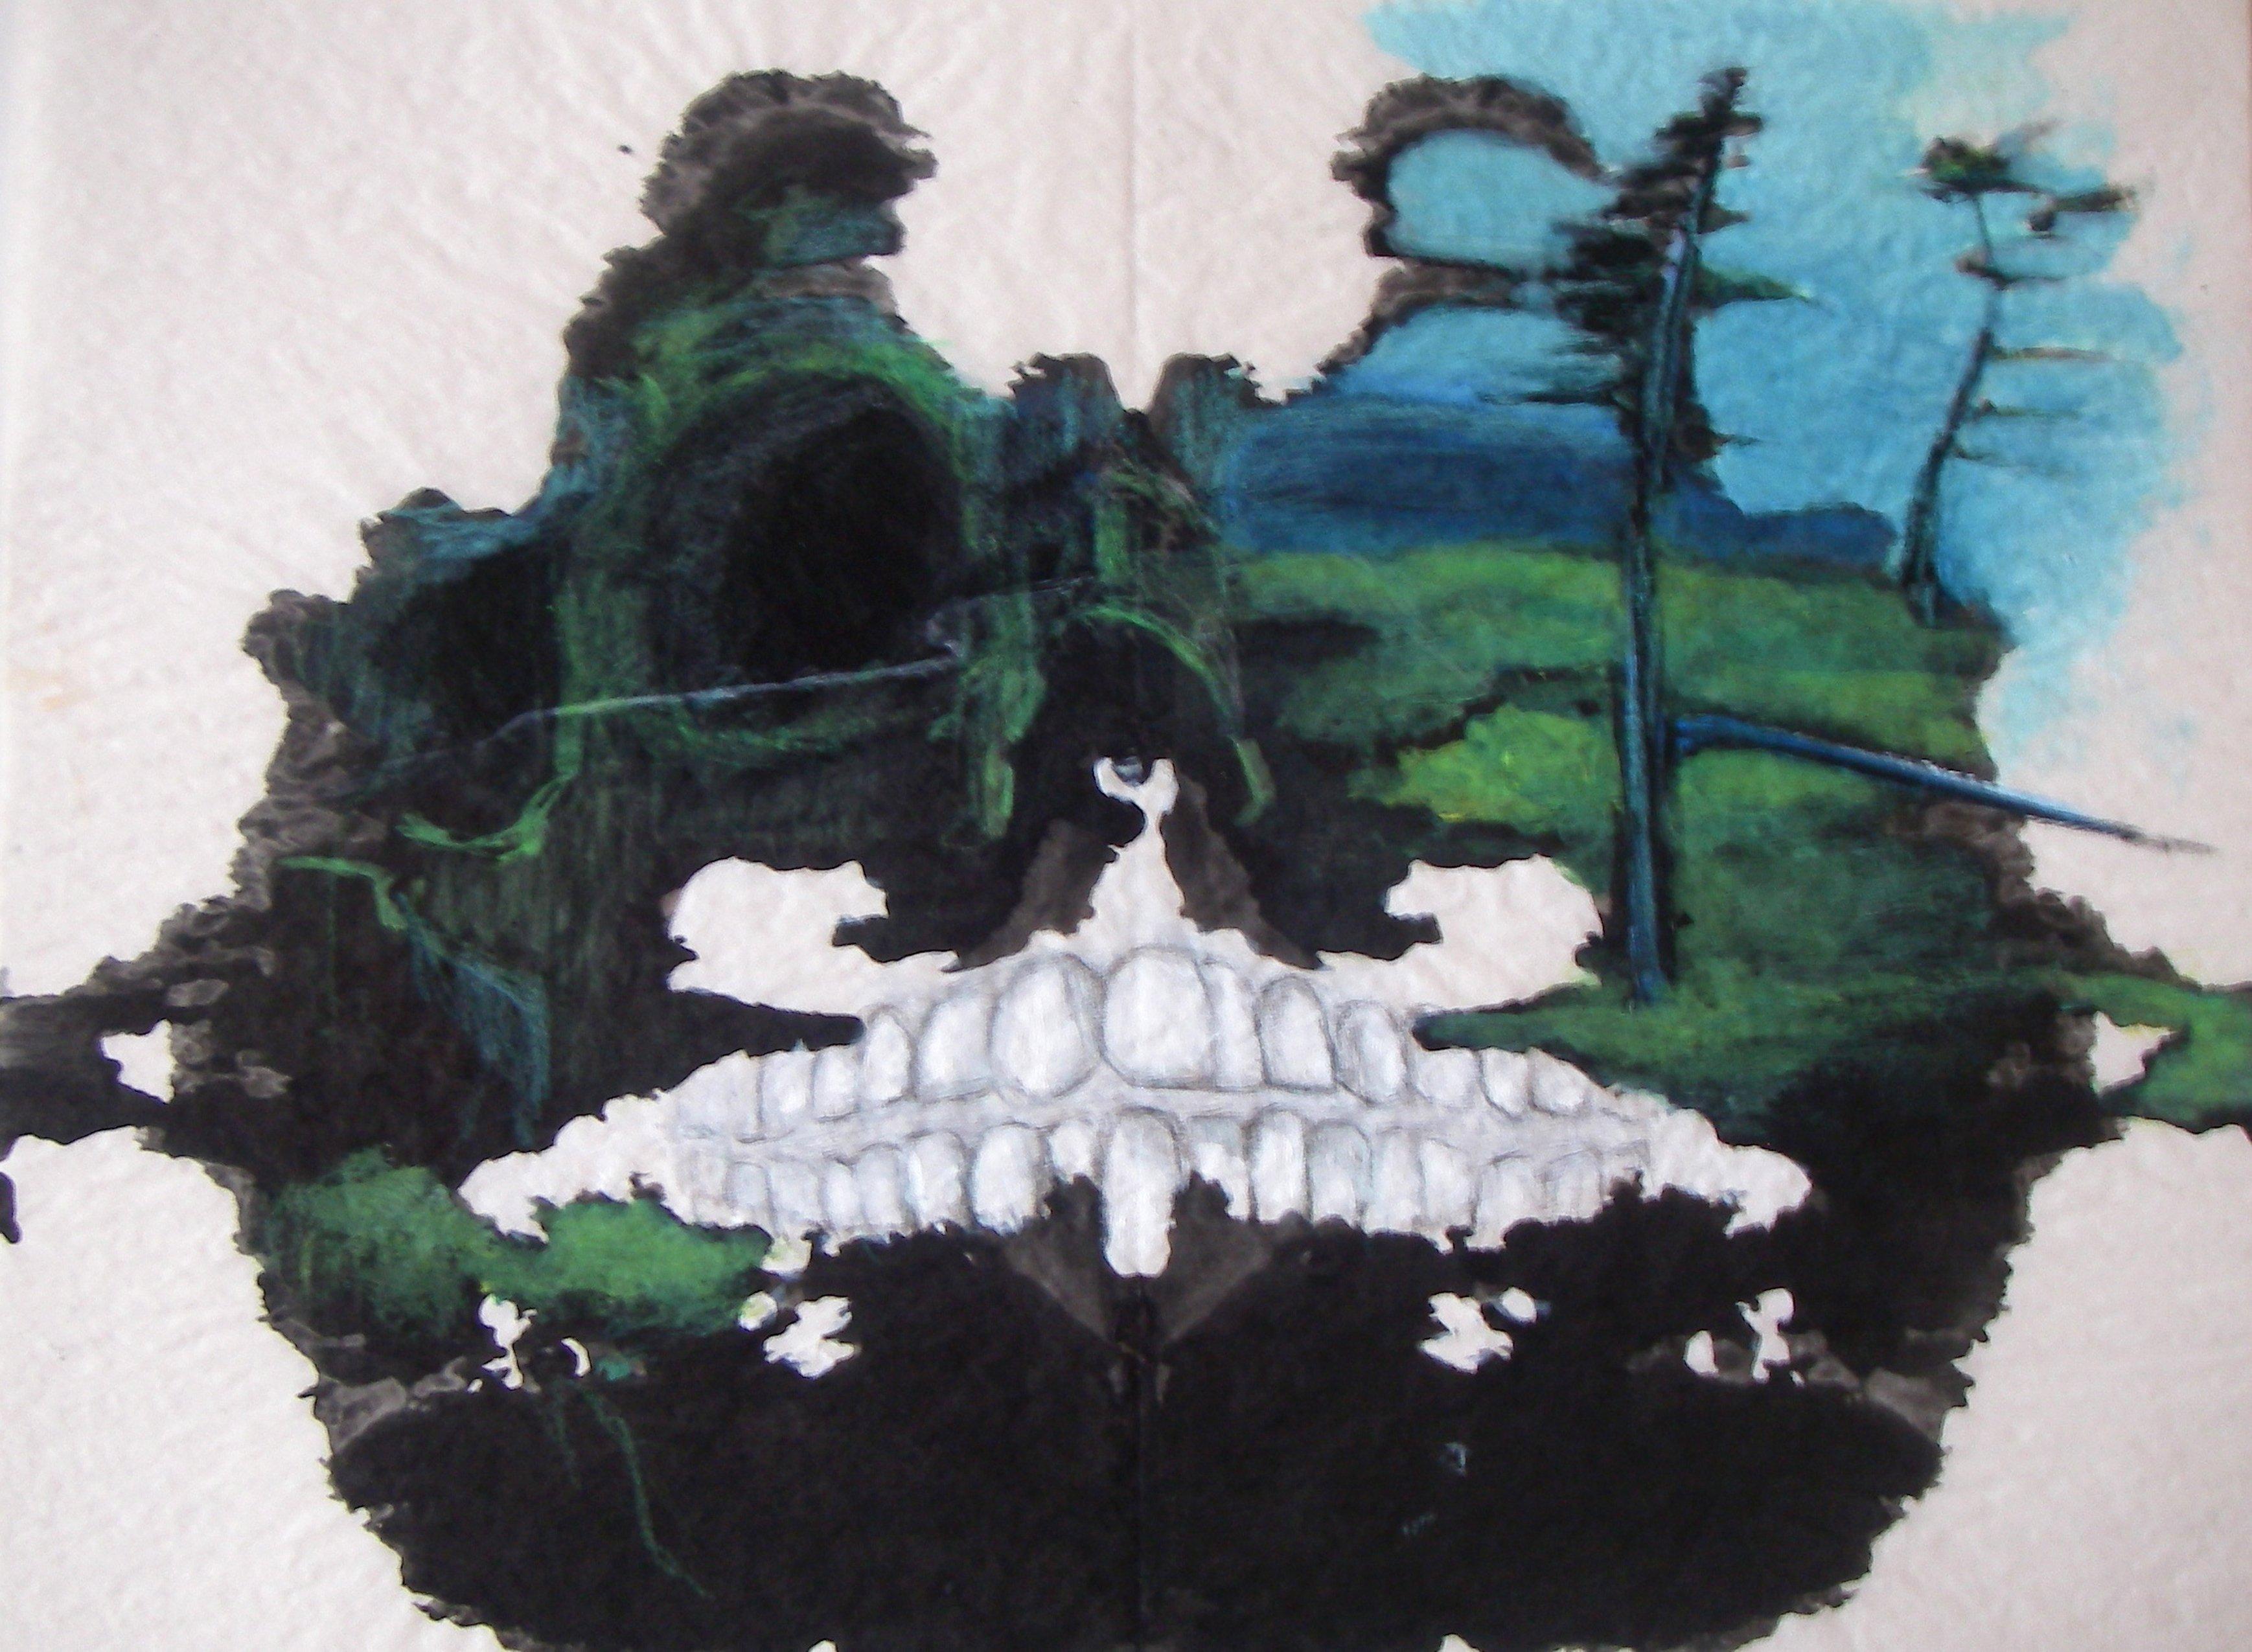 Mountain Skull by Jessica Nissen